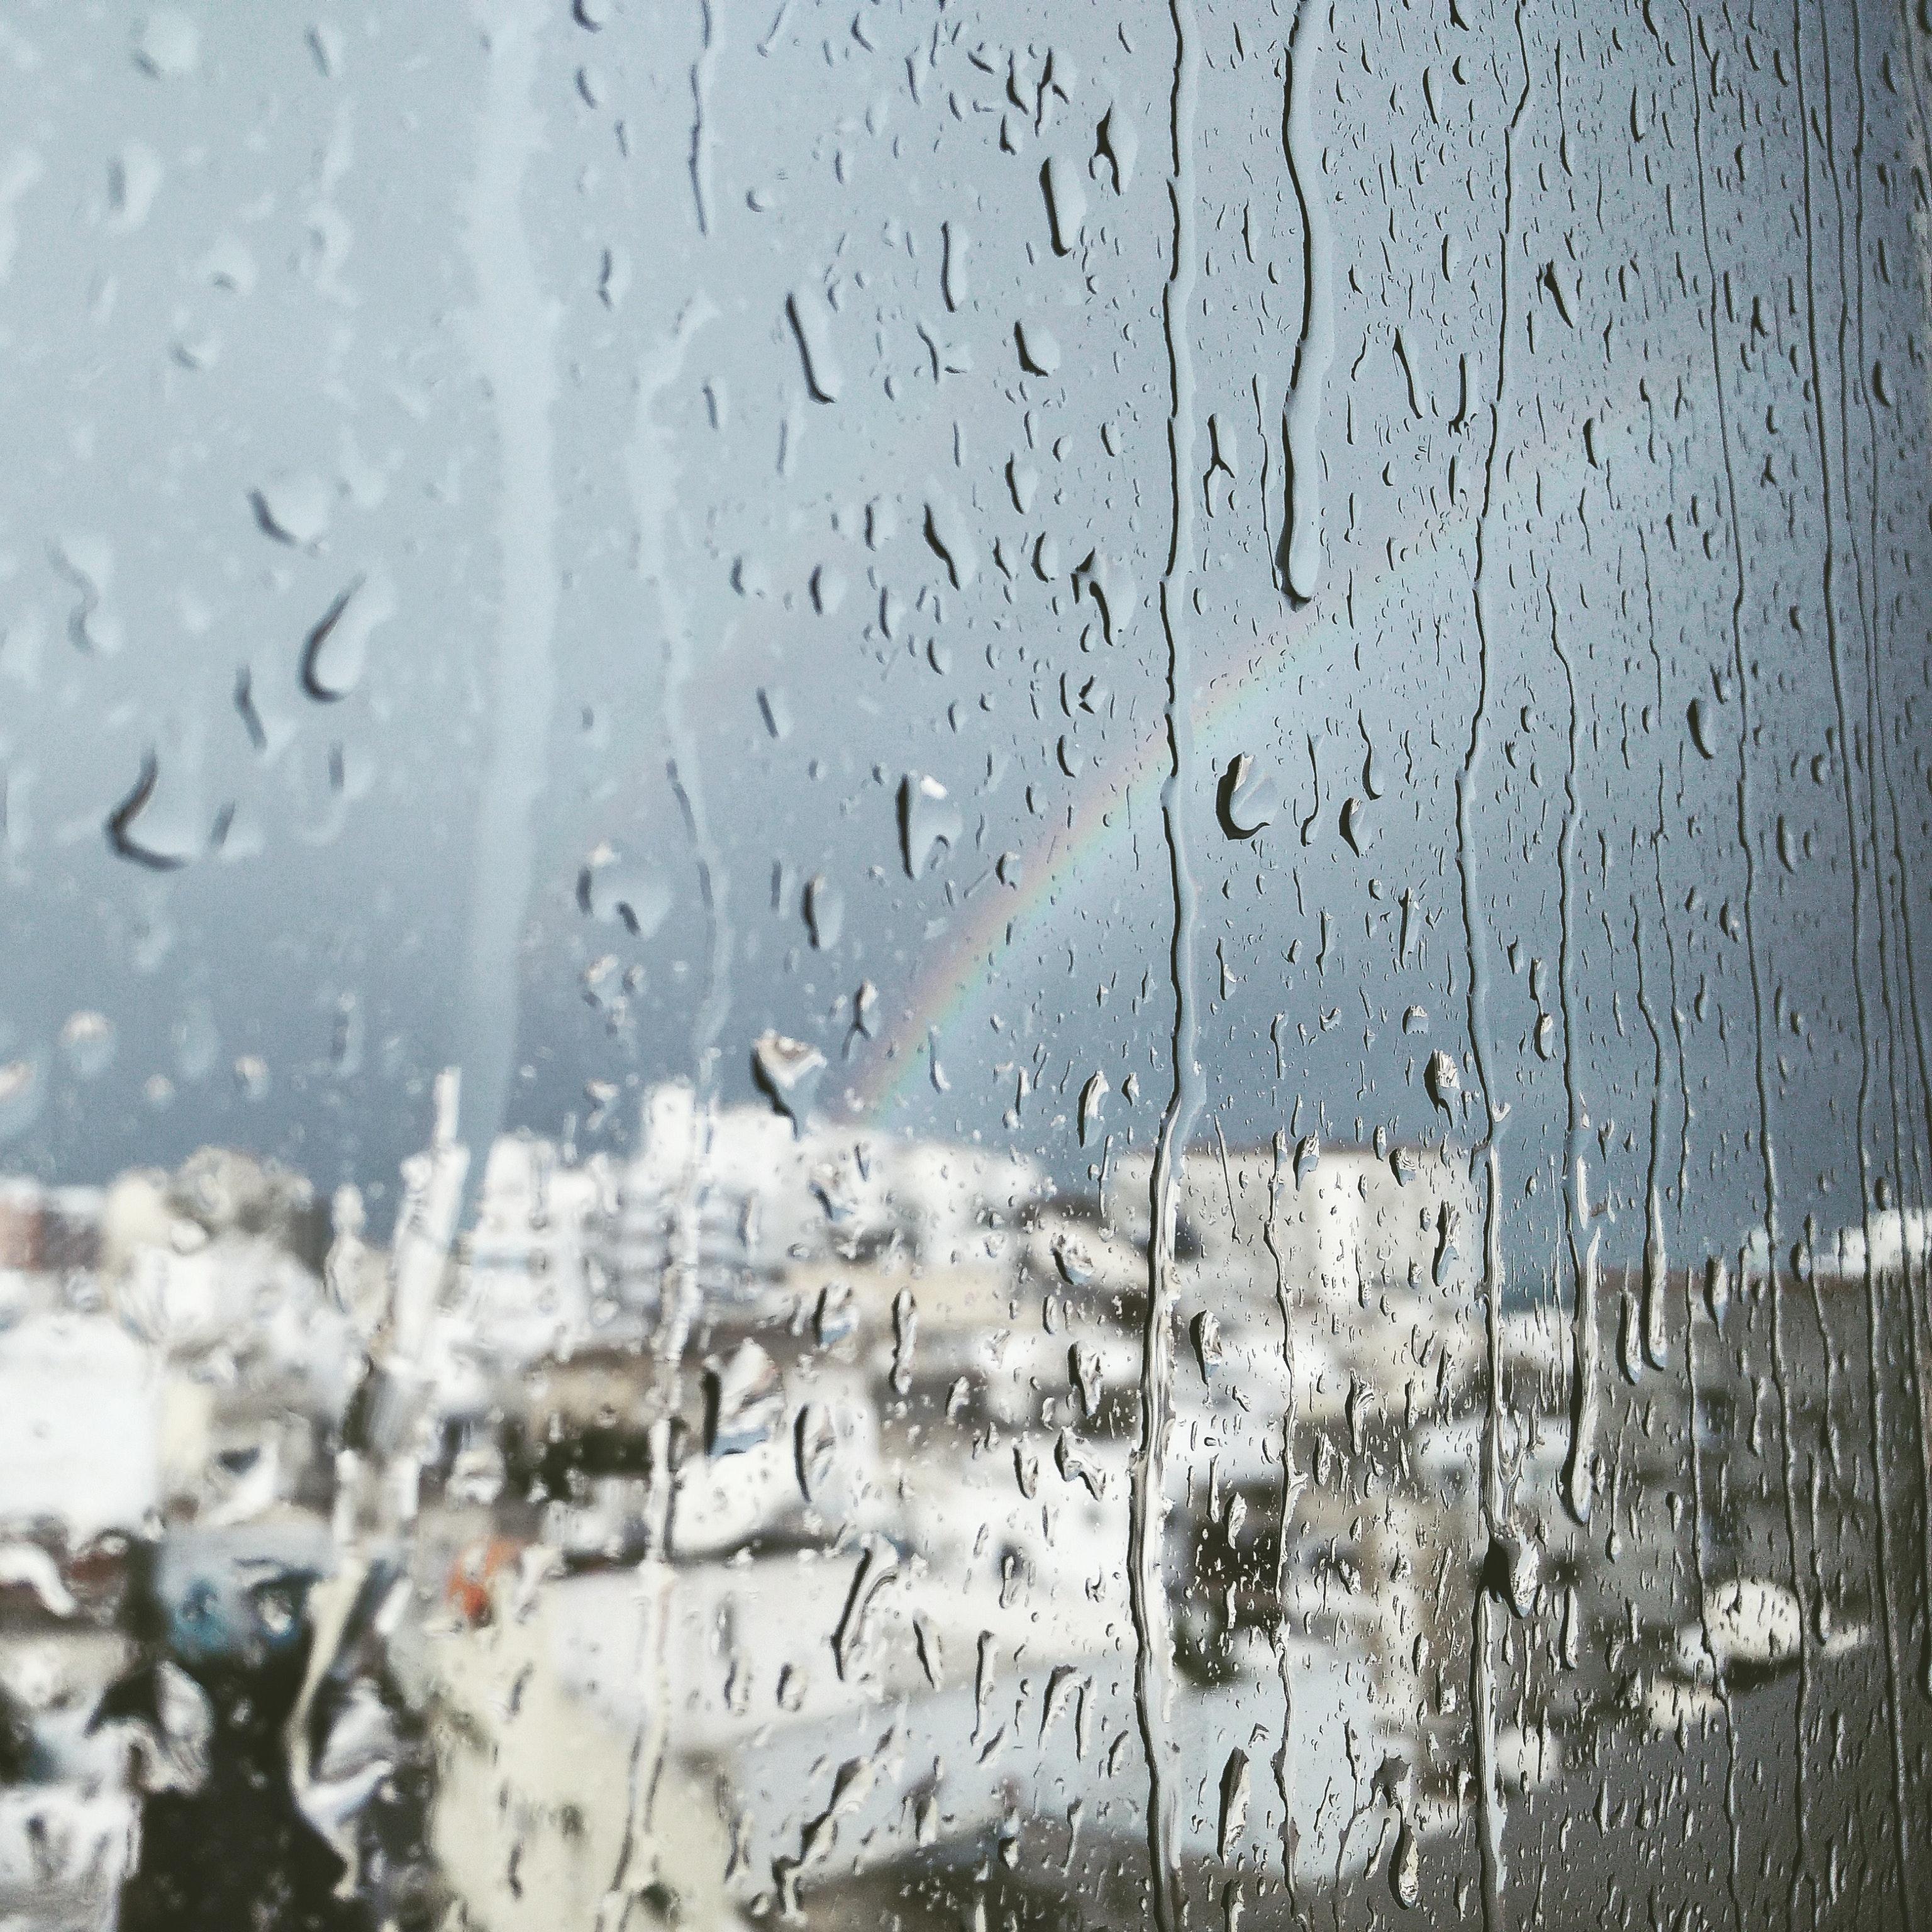 А небо просит белого дождя